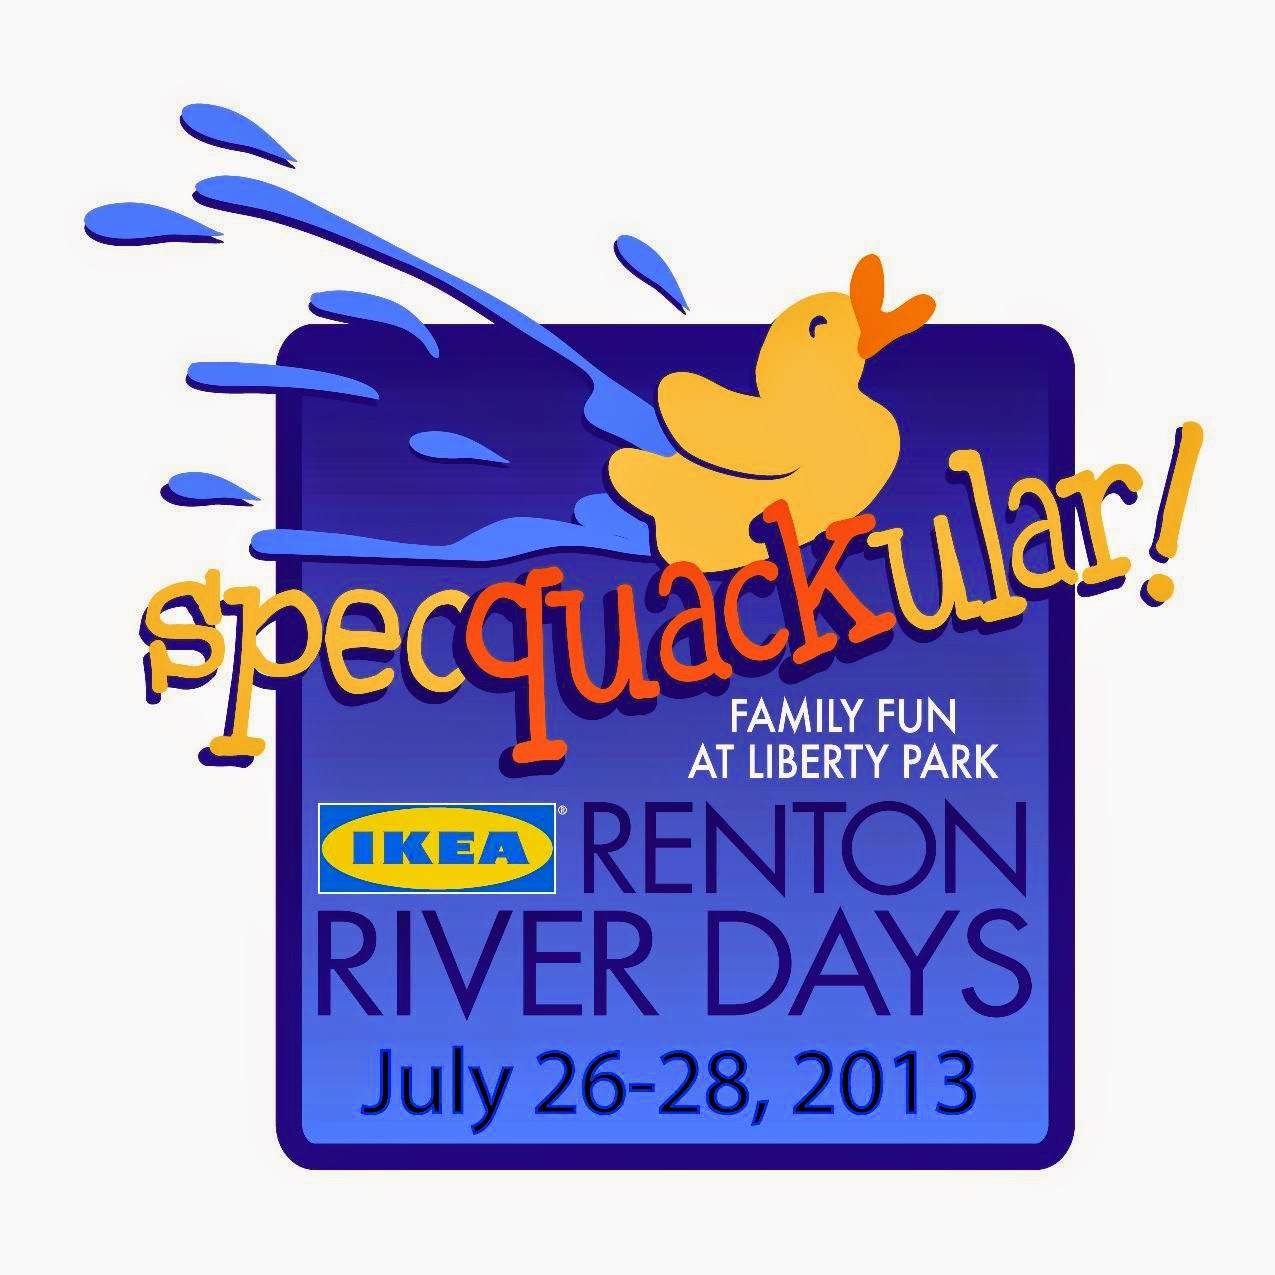 Freeplay kids ikea renton river days specquackular with for Ikea renton hours